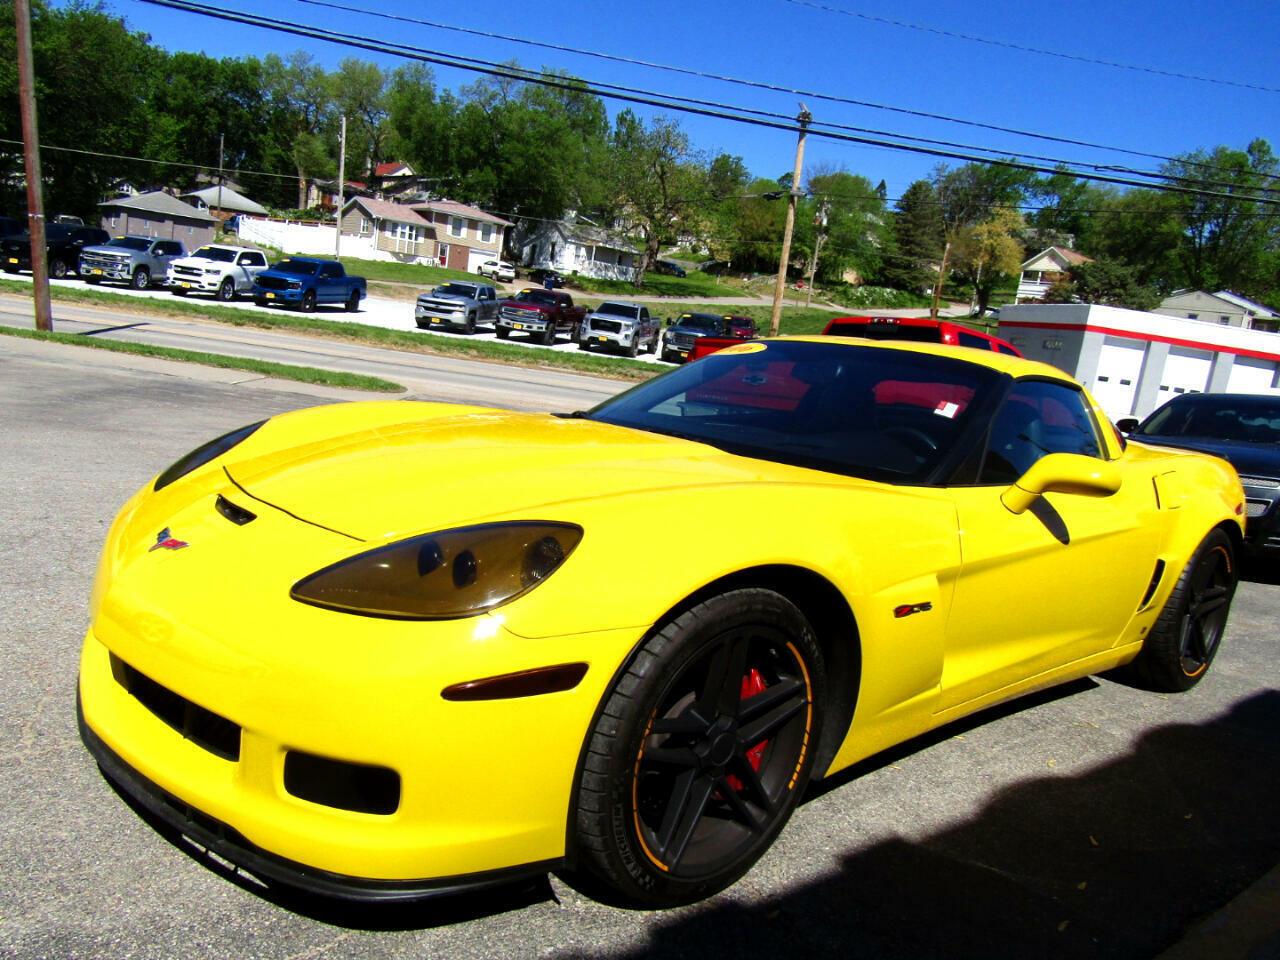 2006 Yellow Chevrolet Corvette Z06  | C6 Corvette Photo 6